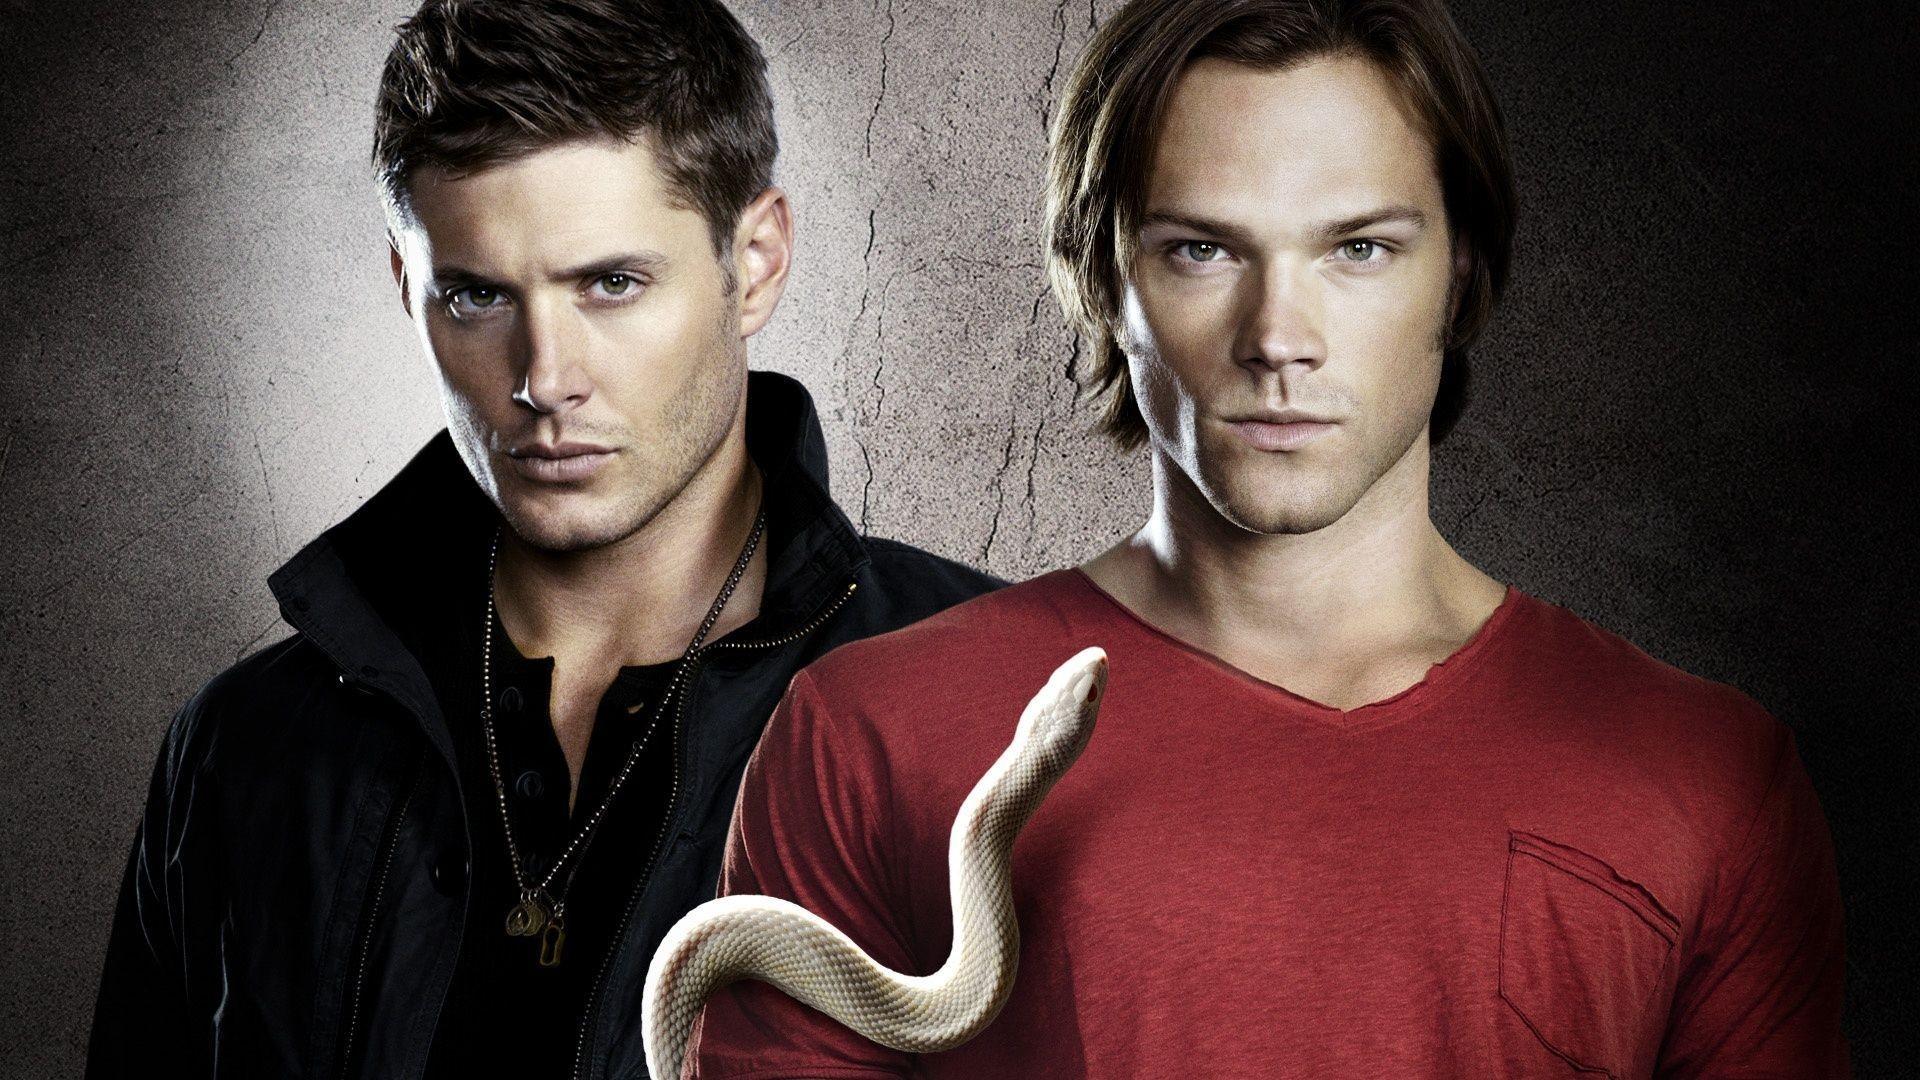 Supernatural: Sam and Dean HD Wallpaper